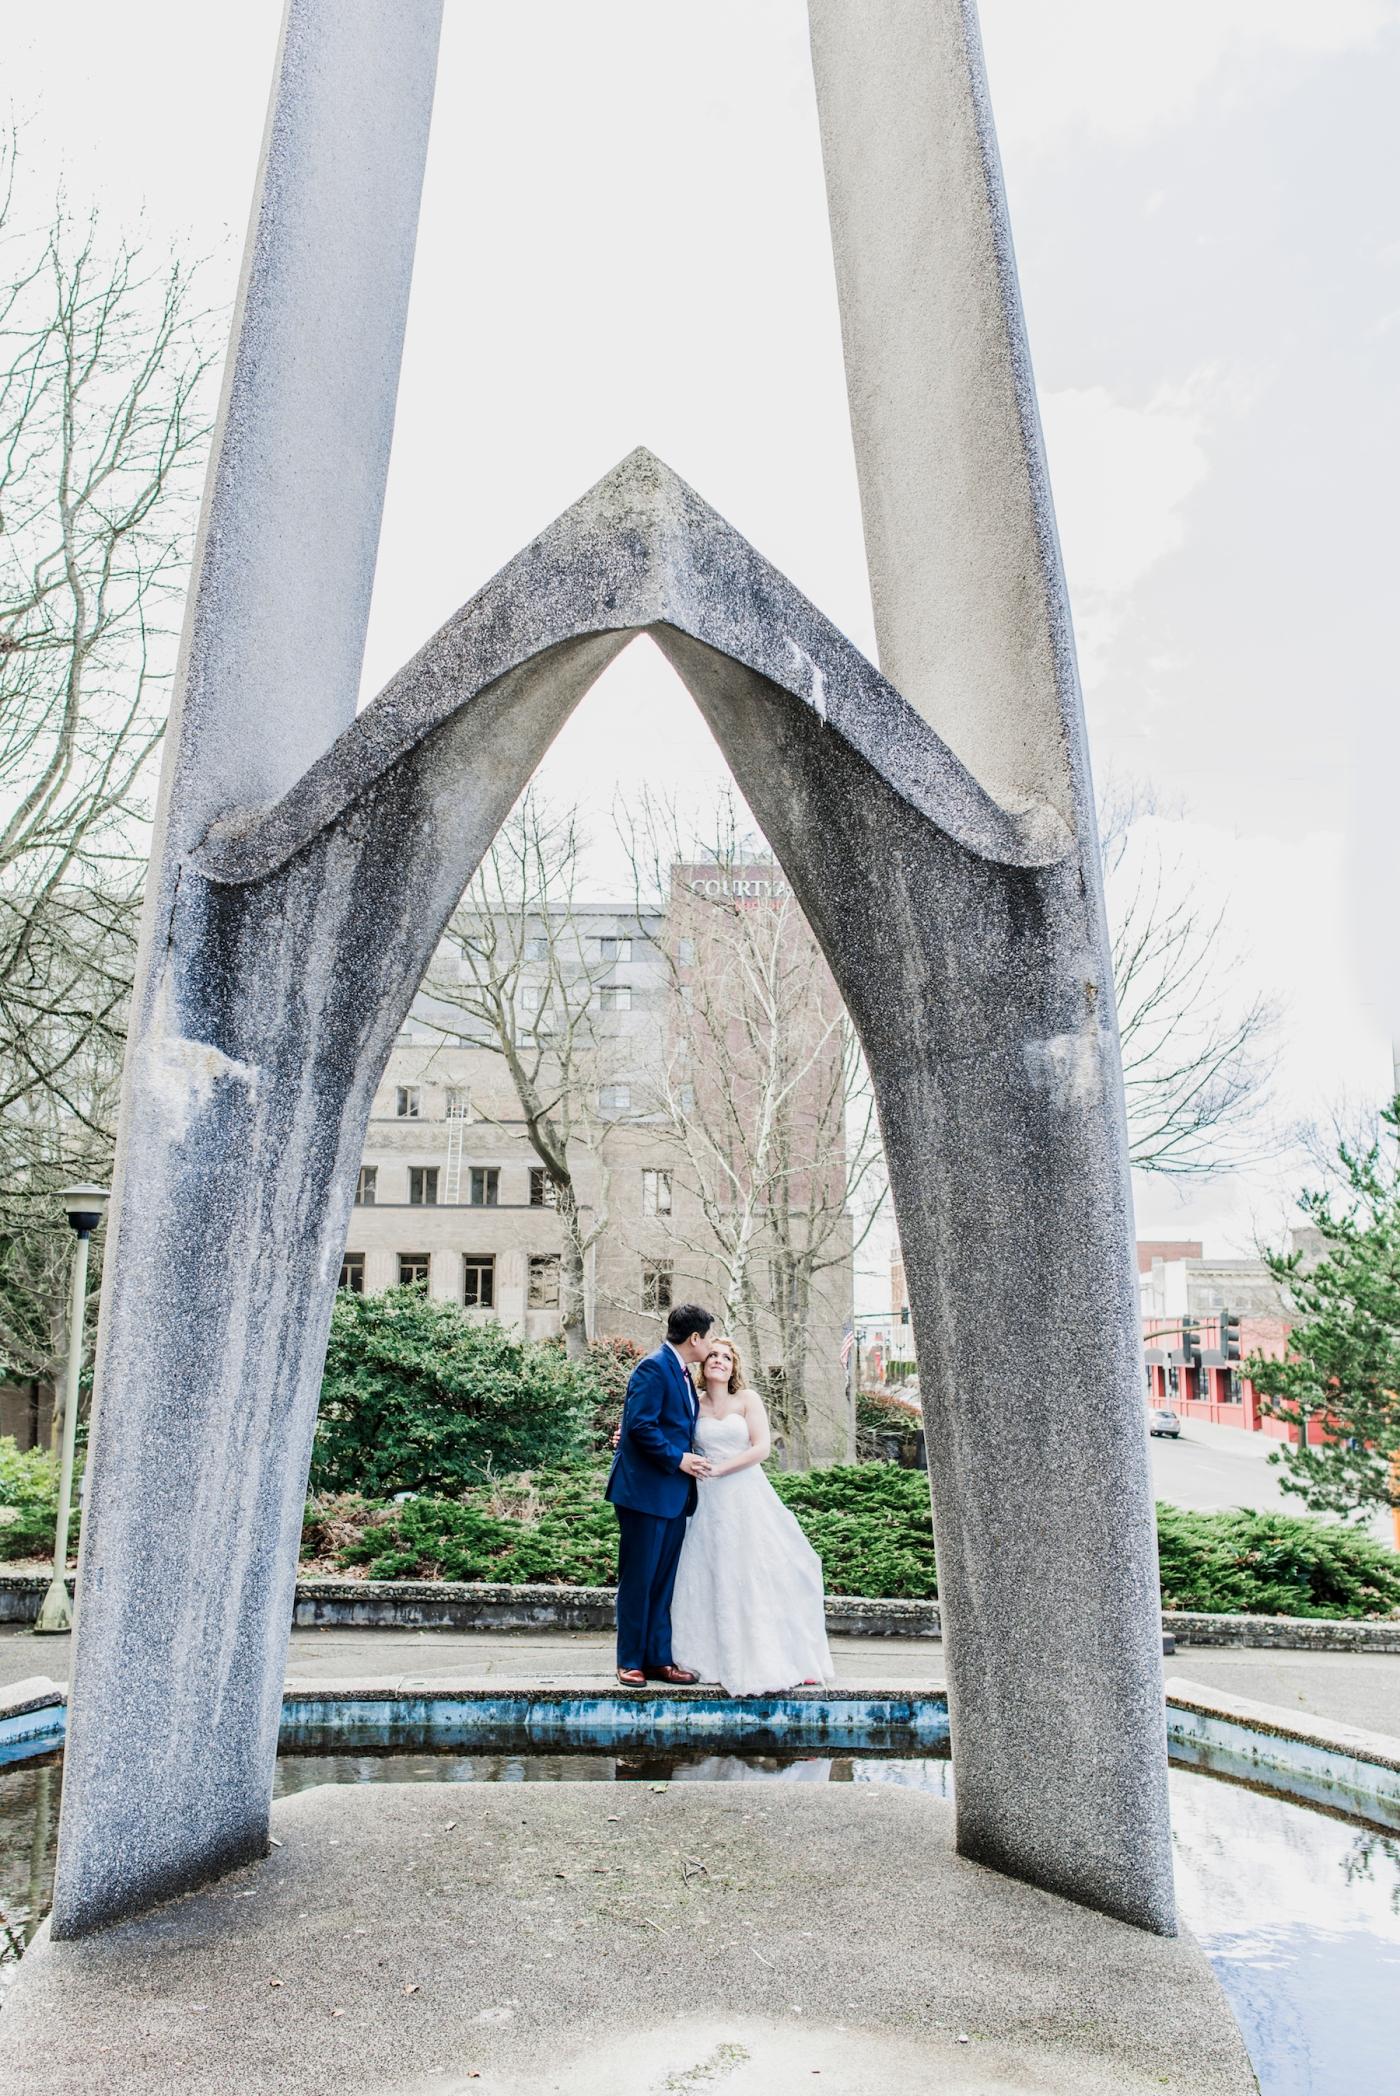 DSC_2310Everett_Wedding_Ballroom_Jane_Speleers_photography_Rachel_and_Edmund_Bridesmaids_peach_dresses_groomsmen_2017